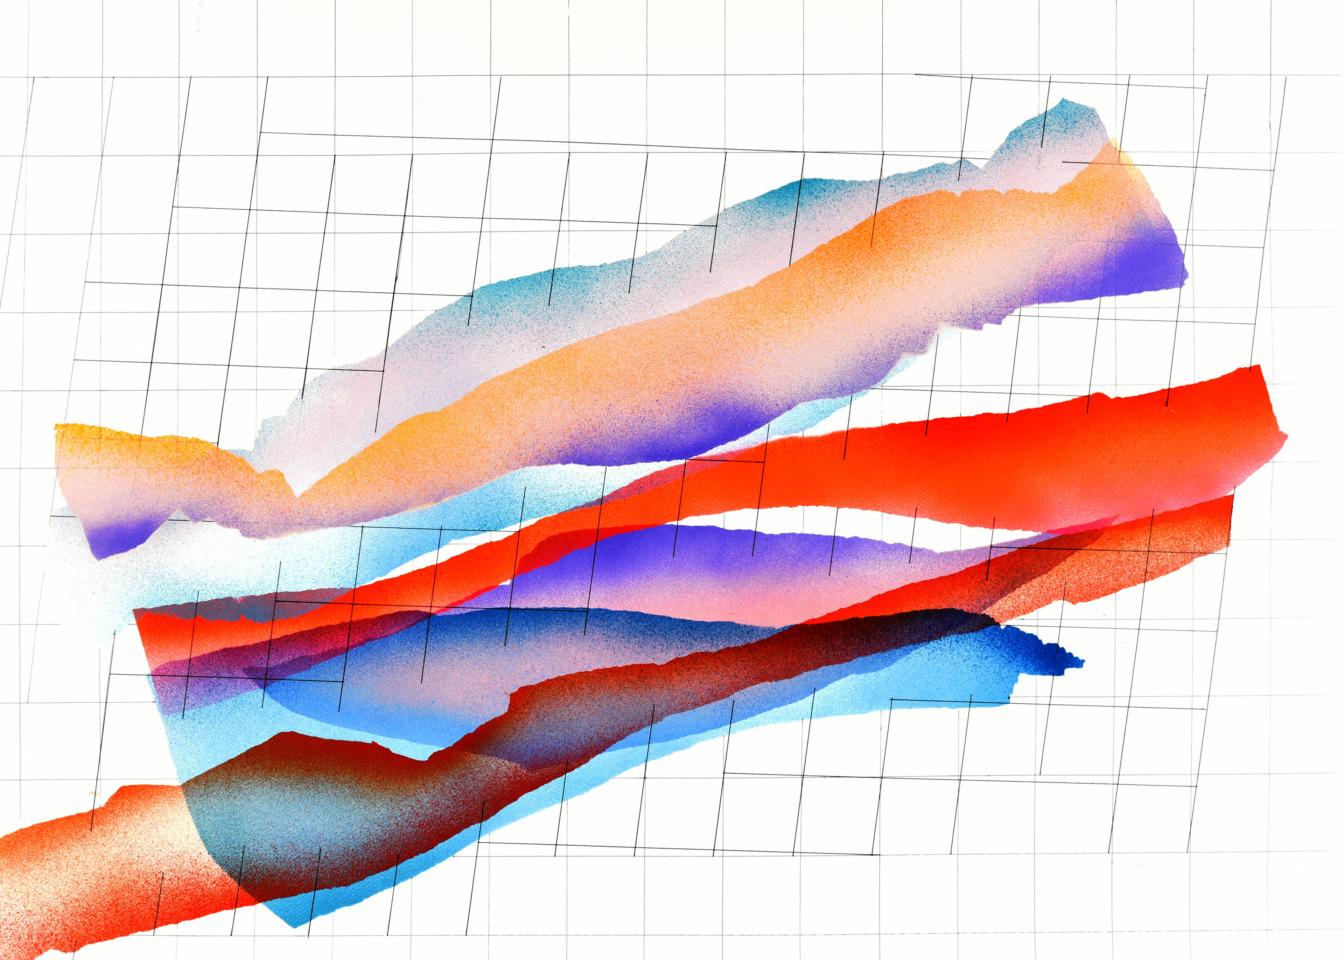 op161219. acrylic on paper, 75x105cm